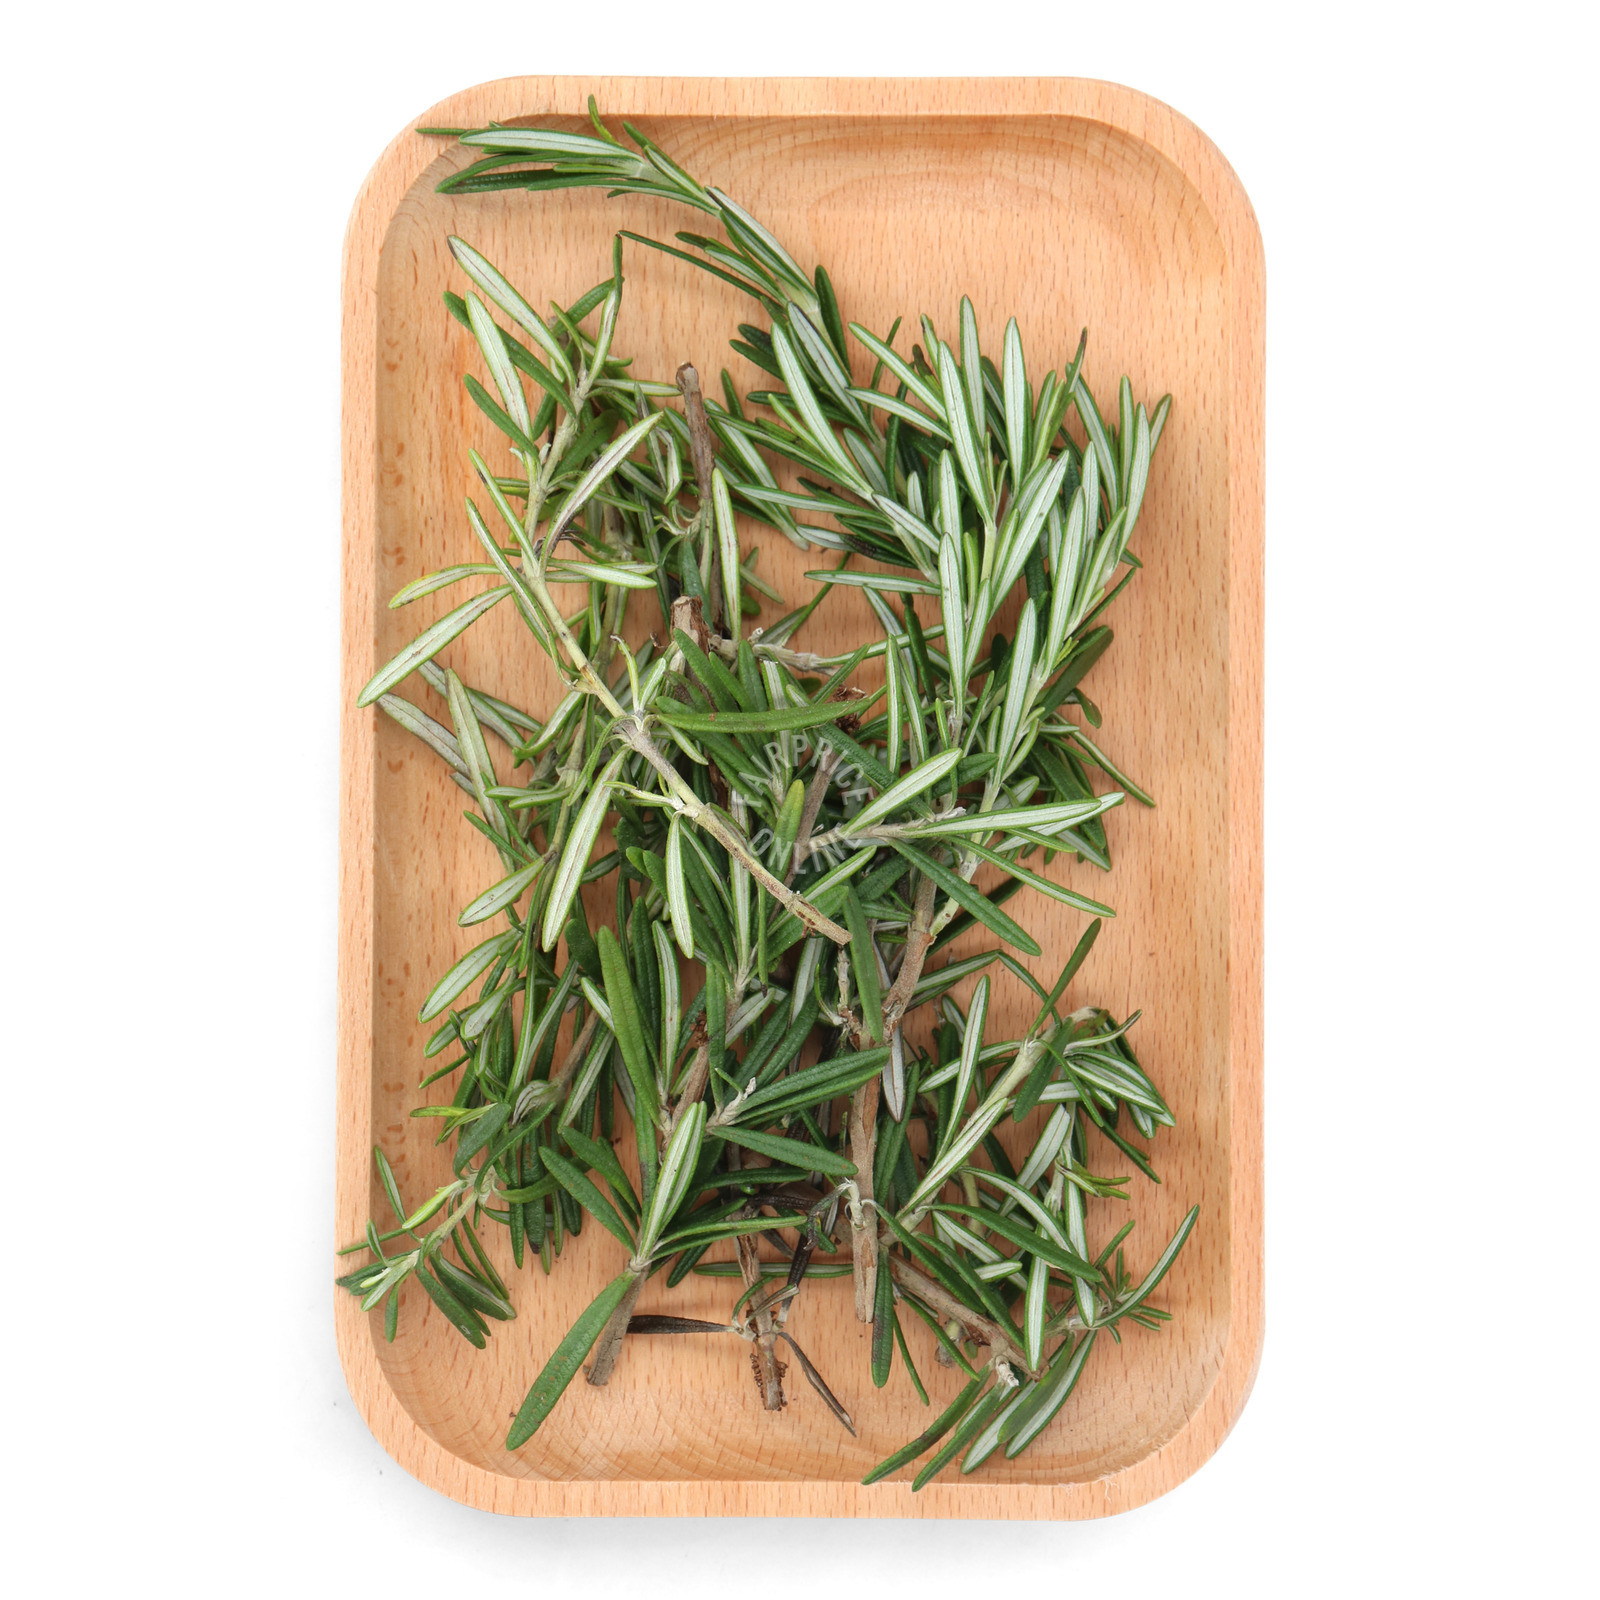 Live Well Fresh Herbs - Rosemary